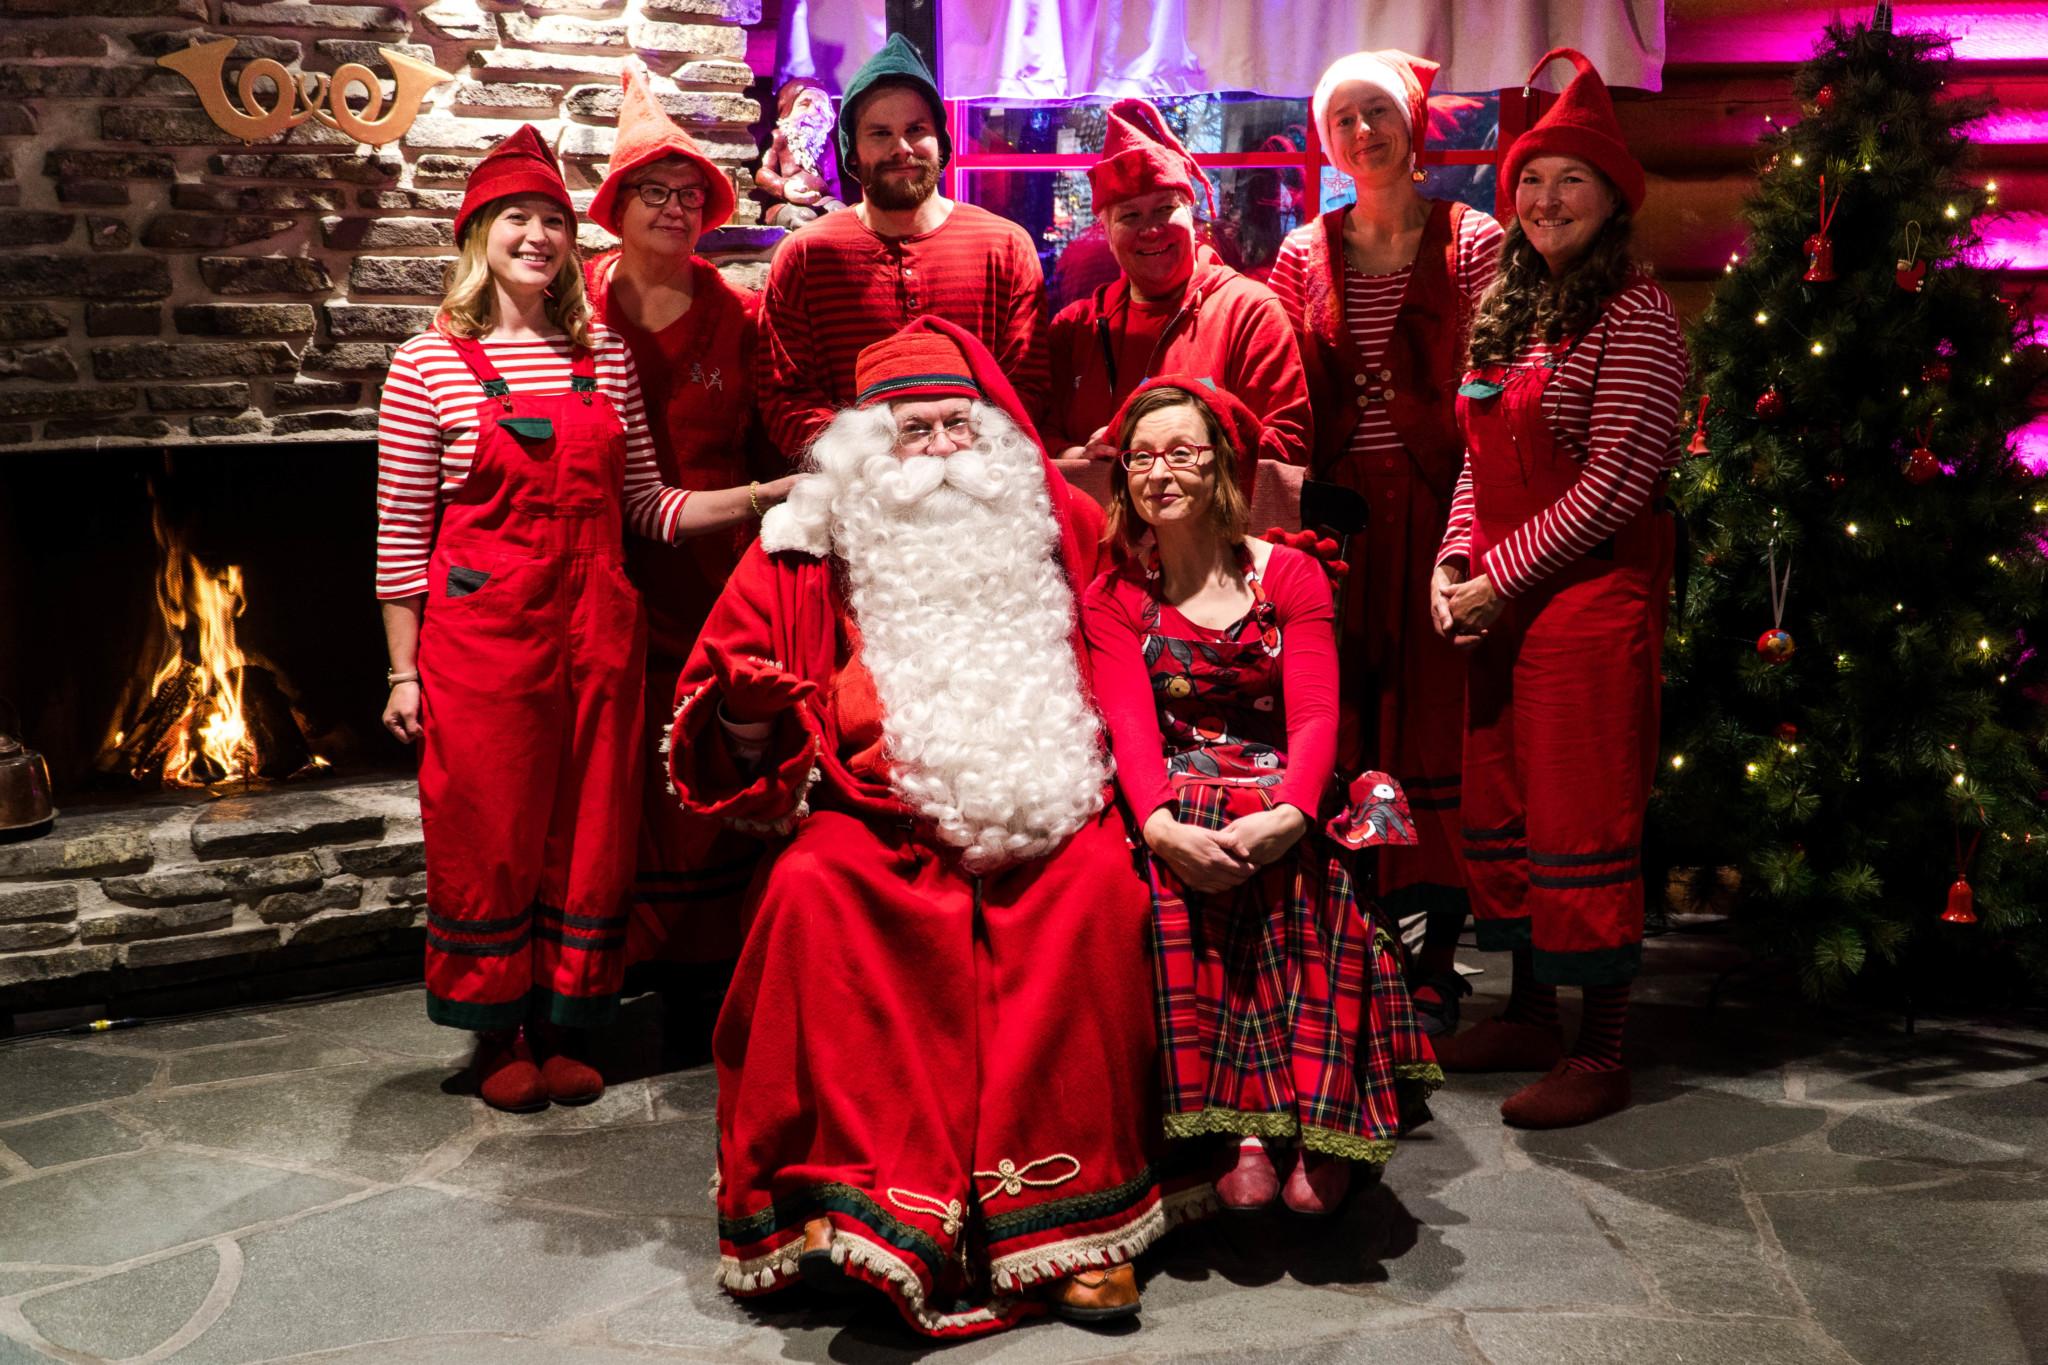 Santa Claus Main Post Office in Rovaniemi Lapland Finland